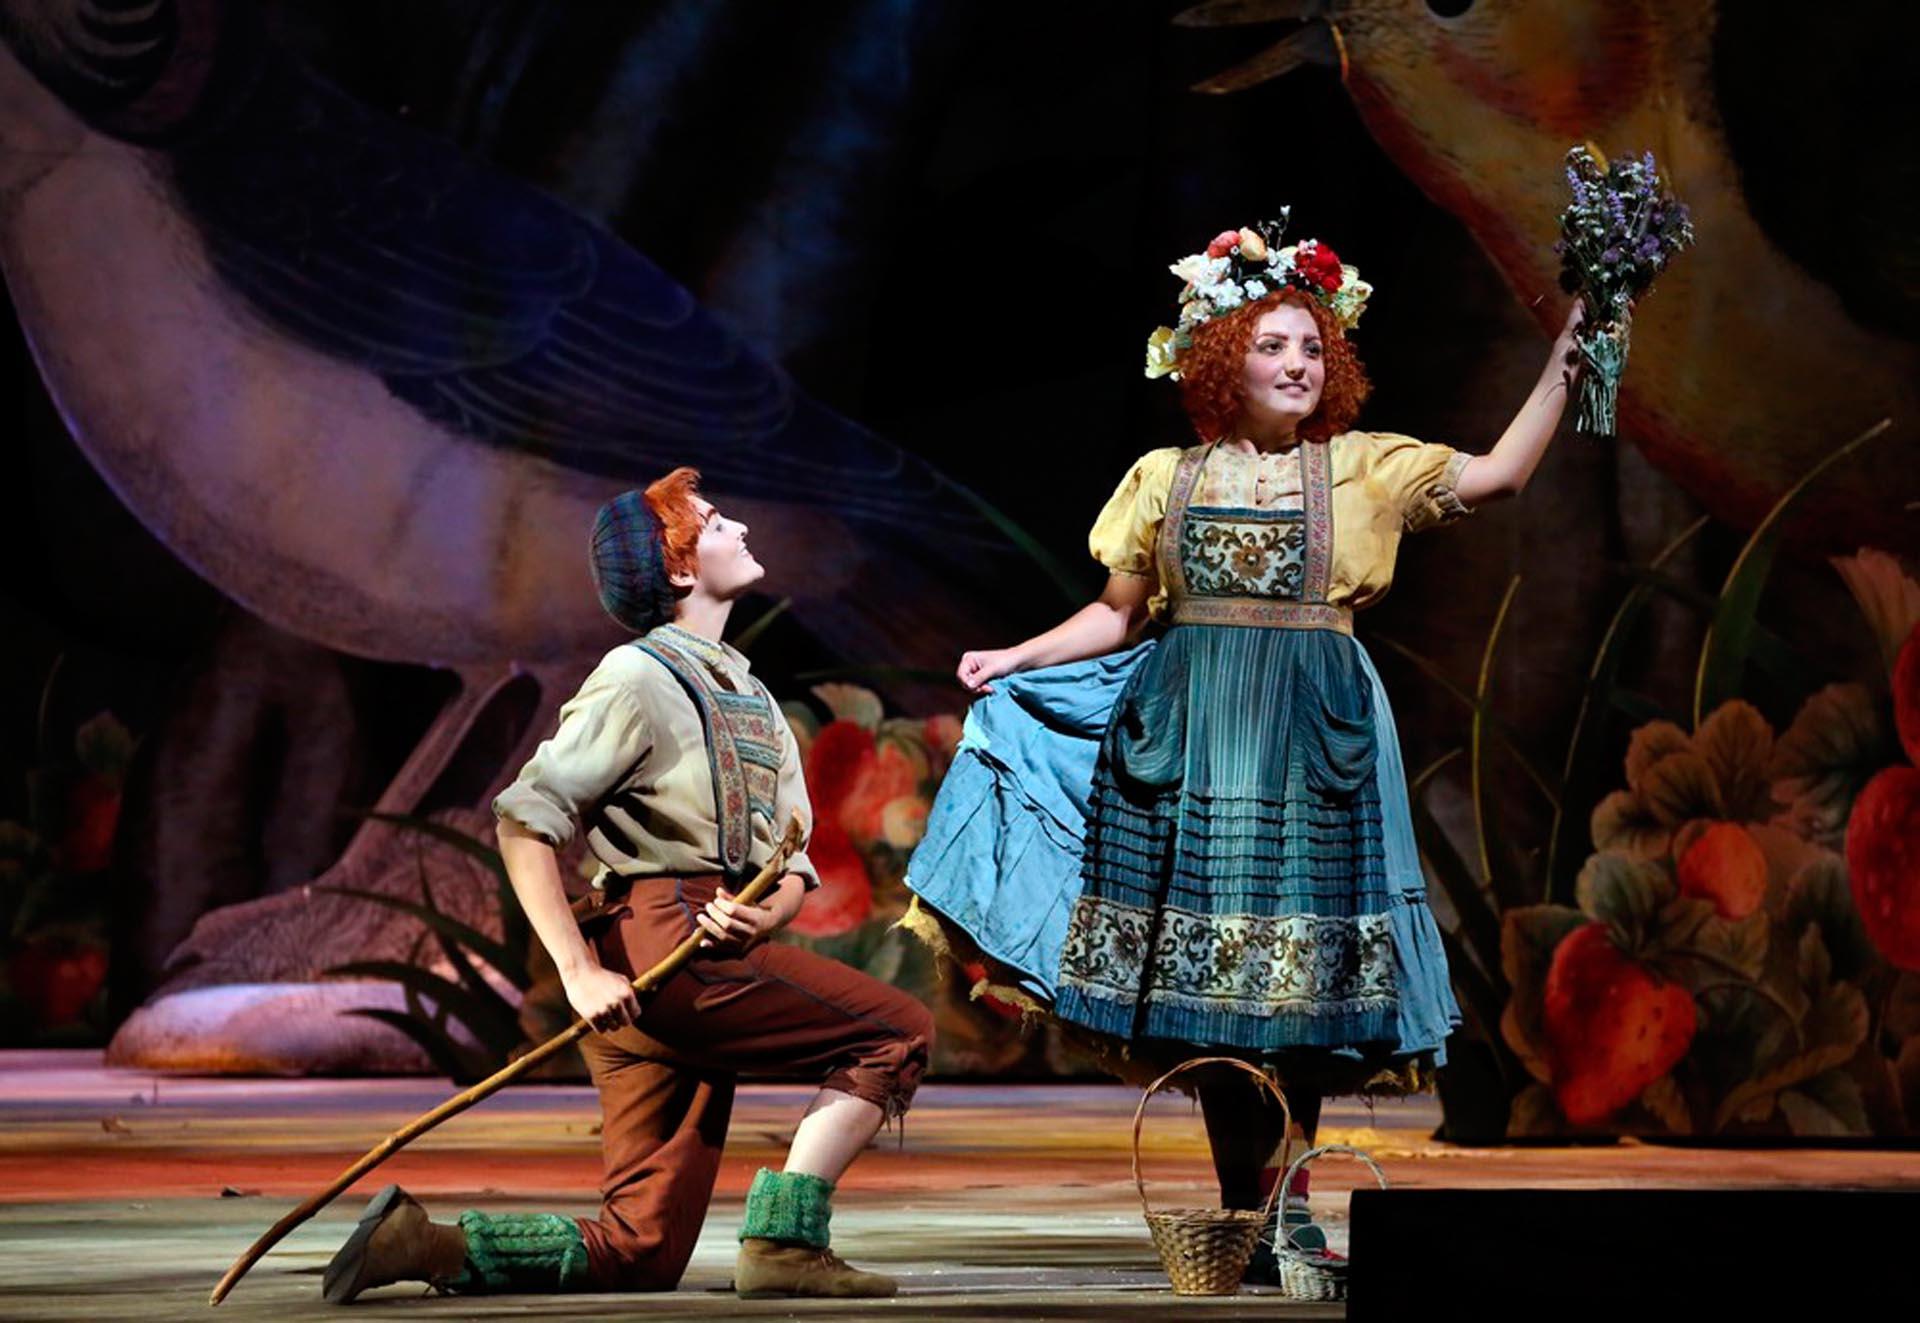 01 Hänsel und Gretel, Teatro alla Scala, 2017, © Brescia und Amisano